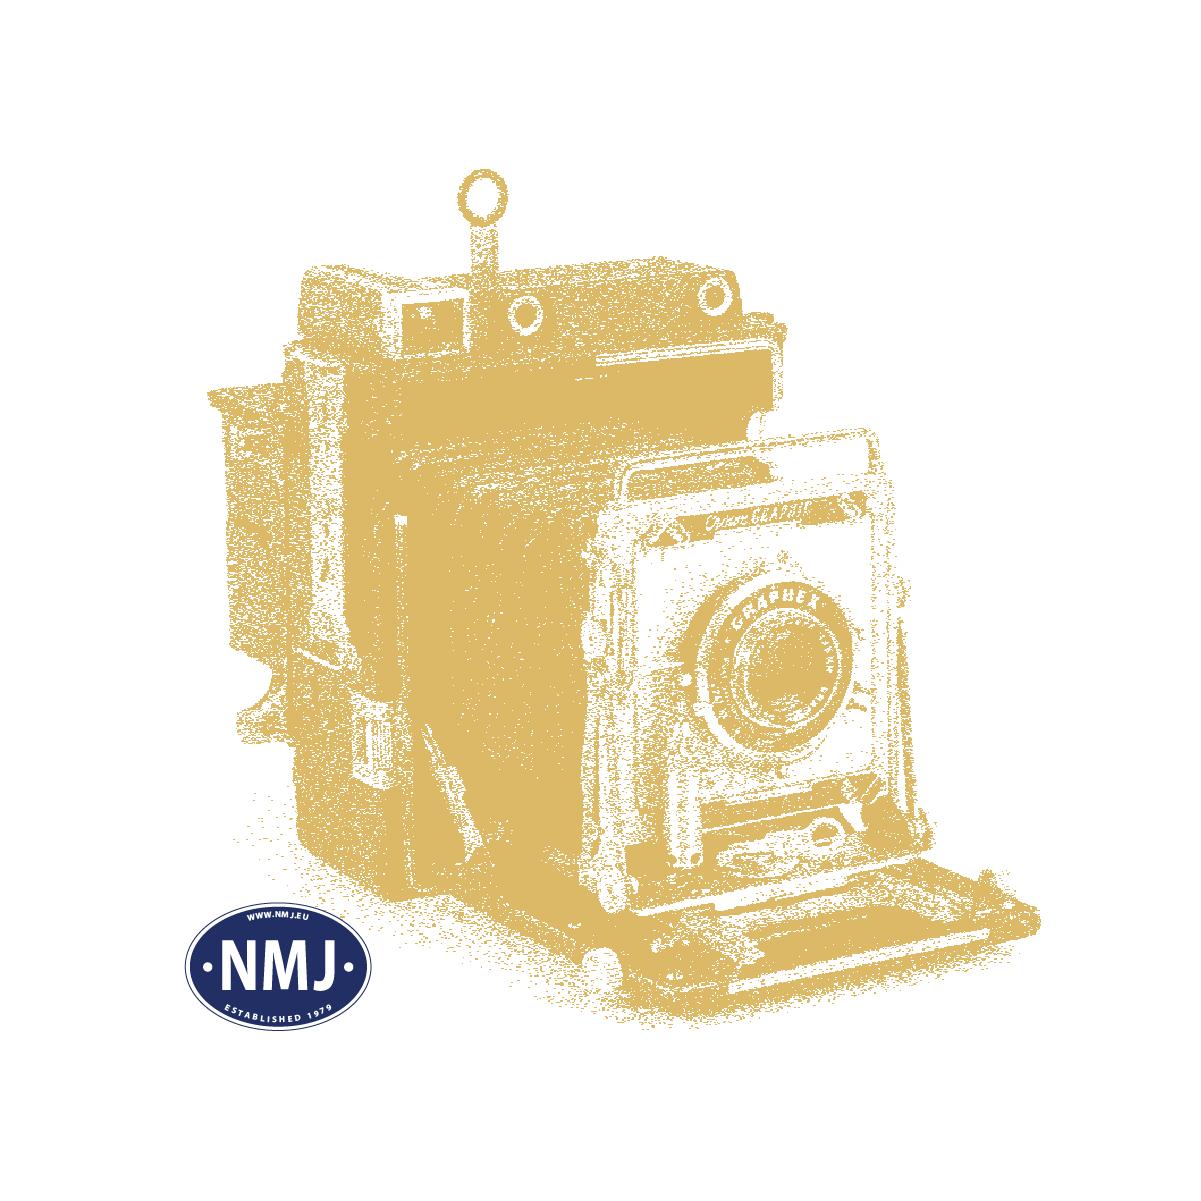 NMJT90204 - NMJ Topline MAV M61.020, DCC Sound